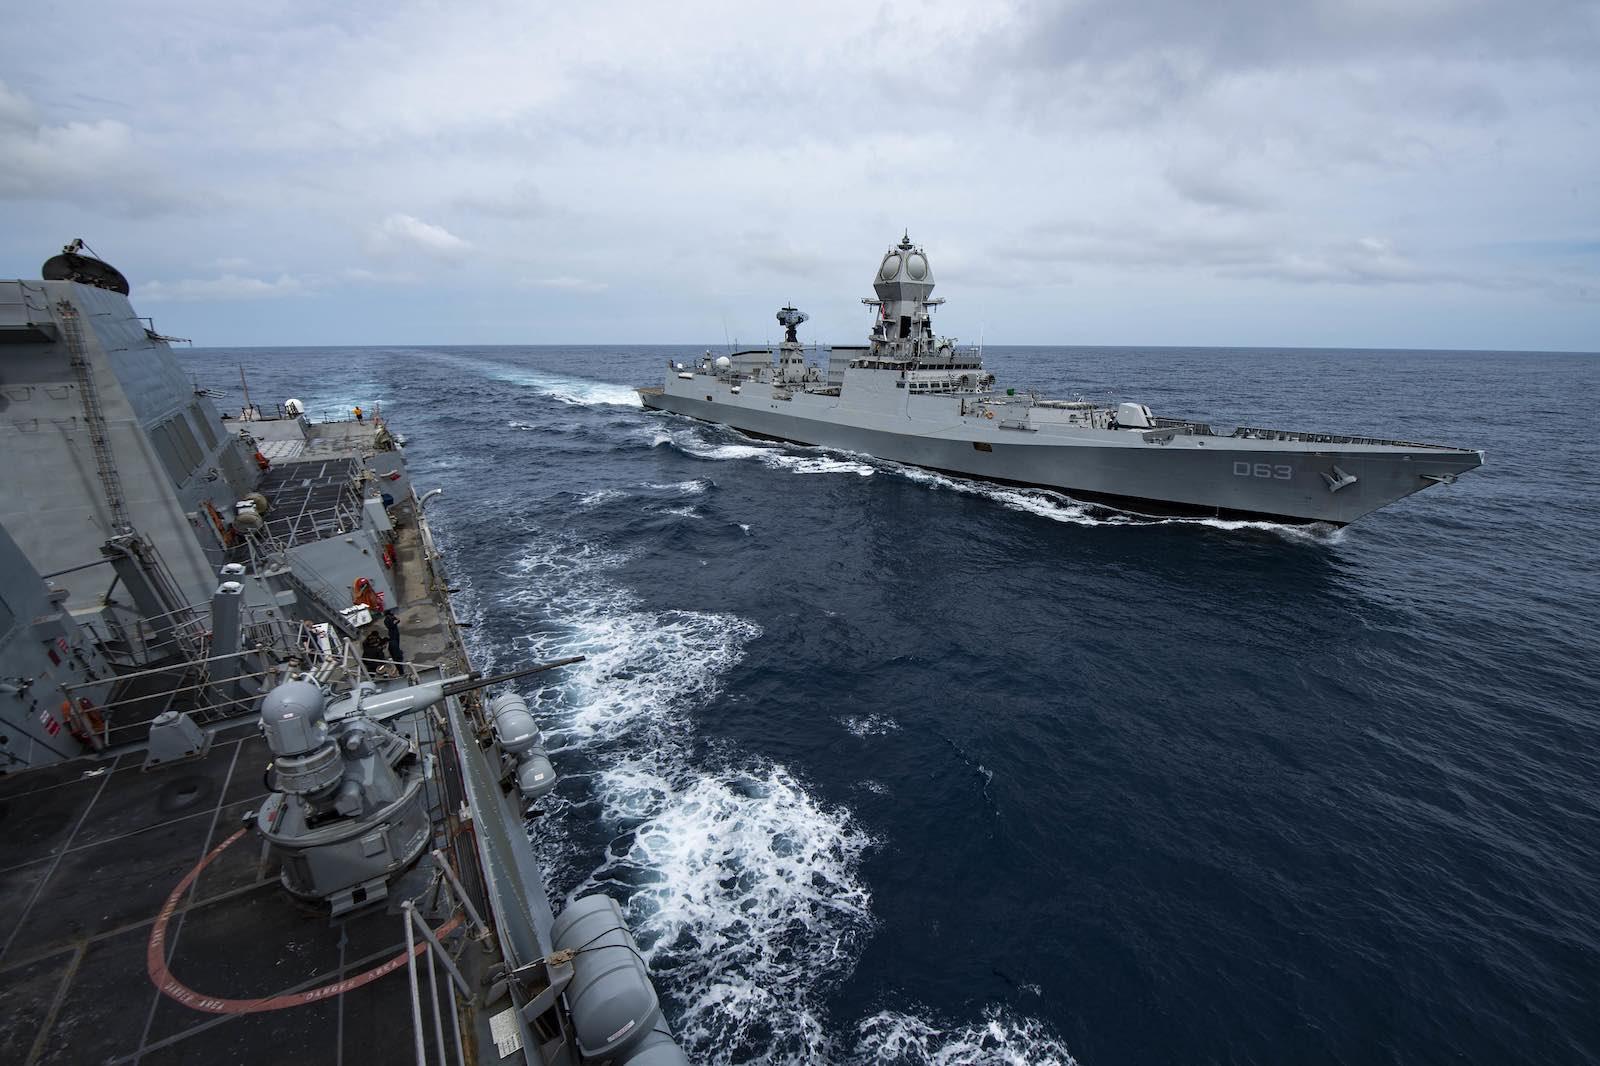 The Indian Navy destroyer INS Kolkata alongside guided-missile destroyer USS Sterett during Exercise Malabar, November 2020 (US Pacific Fleet/Flickr)